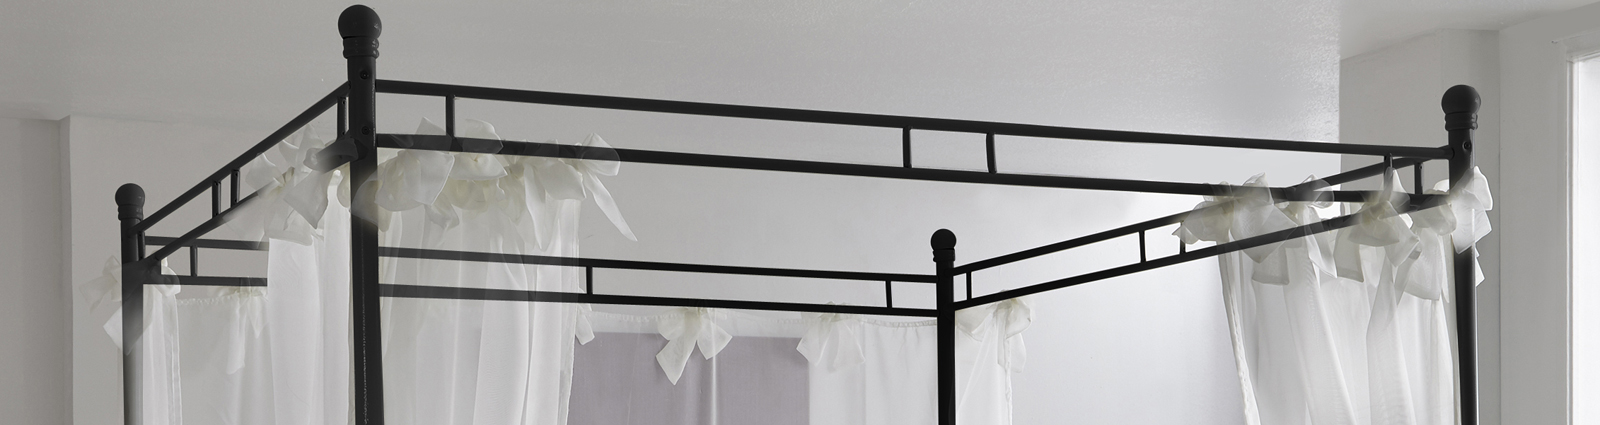 sam design himmelbett 180 cm schwarz venezia auf lager. Black Bedroom Furniture Sets. Home Design Ideas